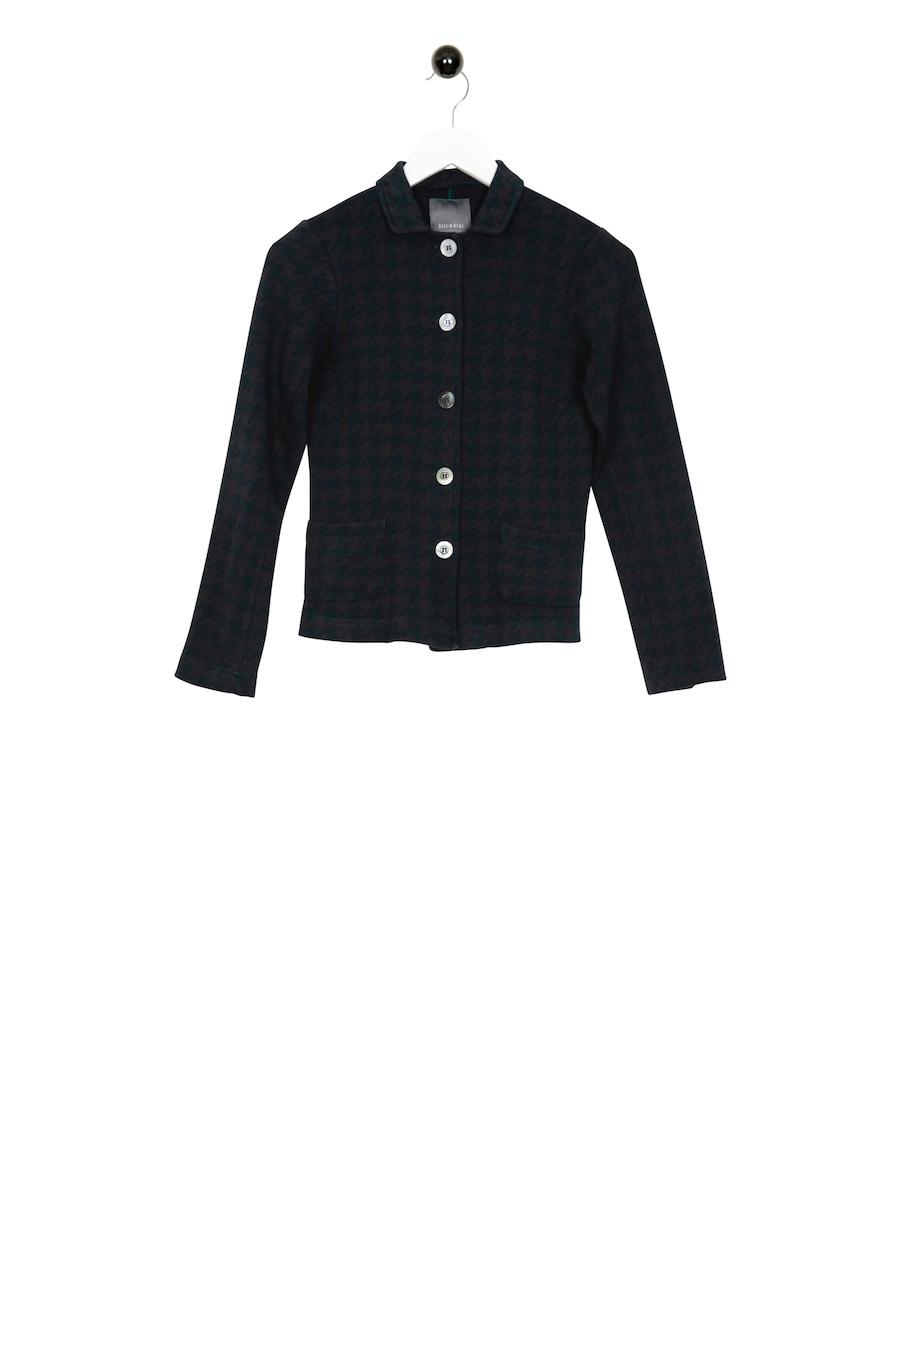 Elgol Jacket